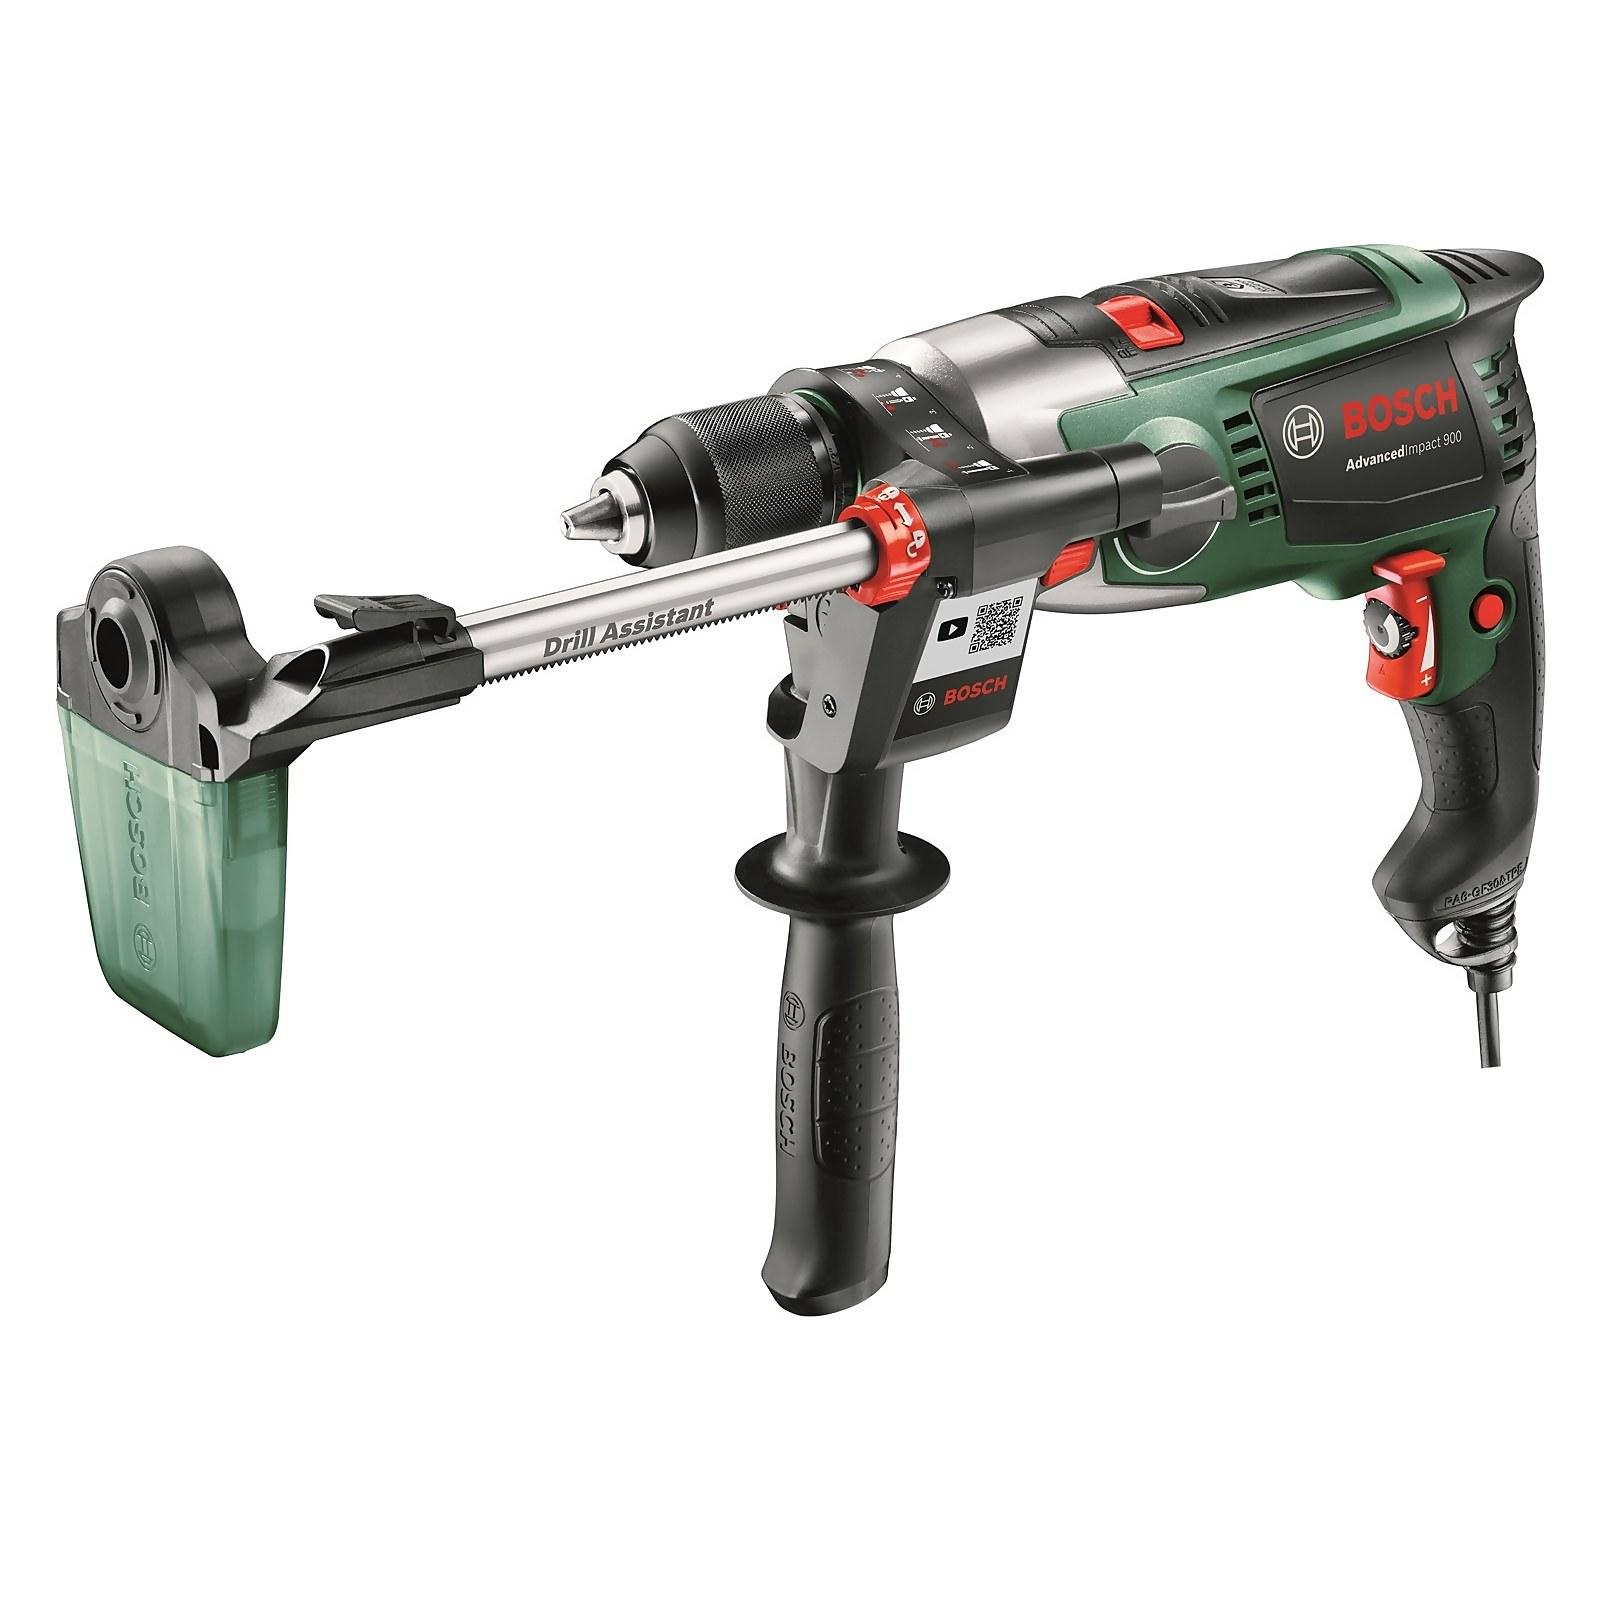 Bosch AdvancedImpact 900W Hammer Drill & Drill Assistant for £65 click & collect @ Homebase